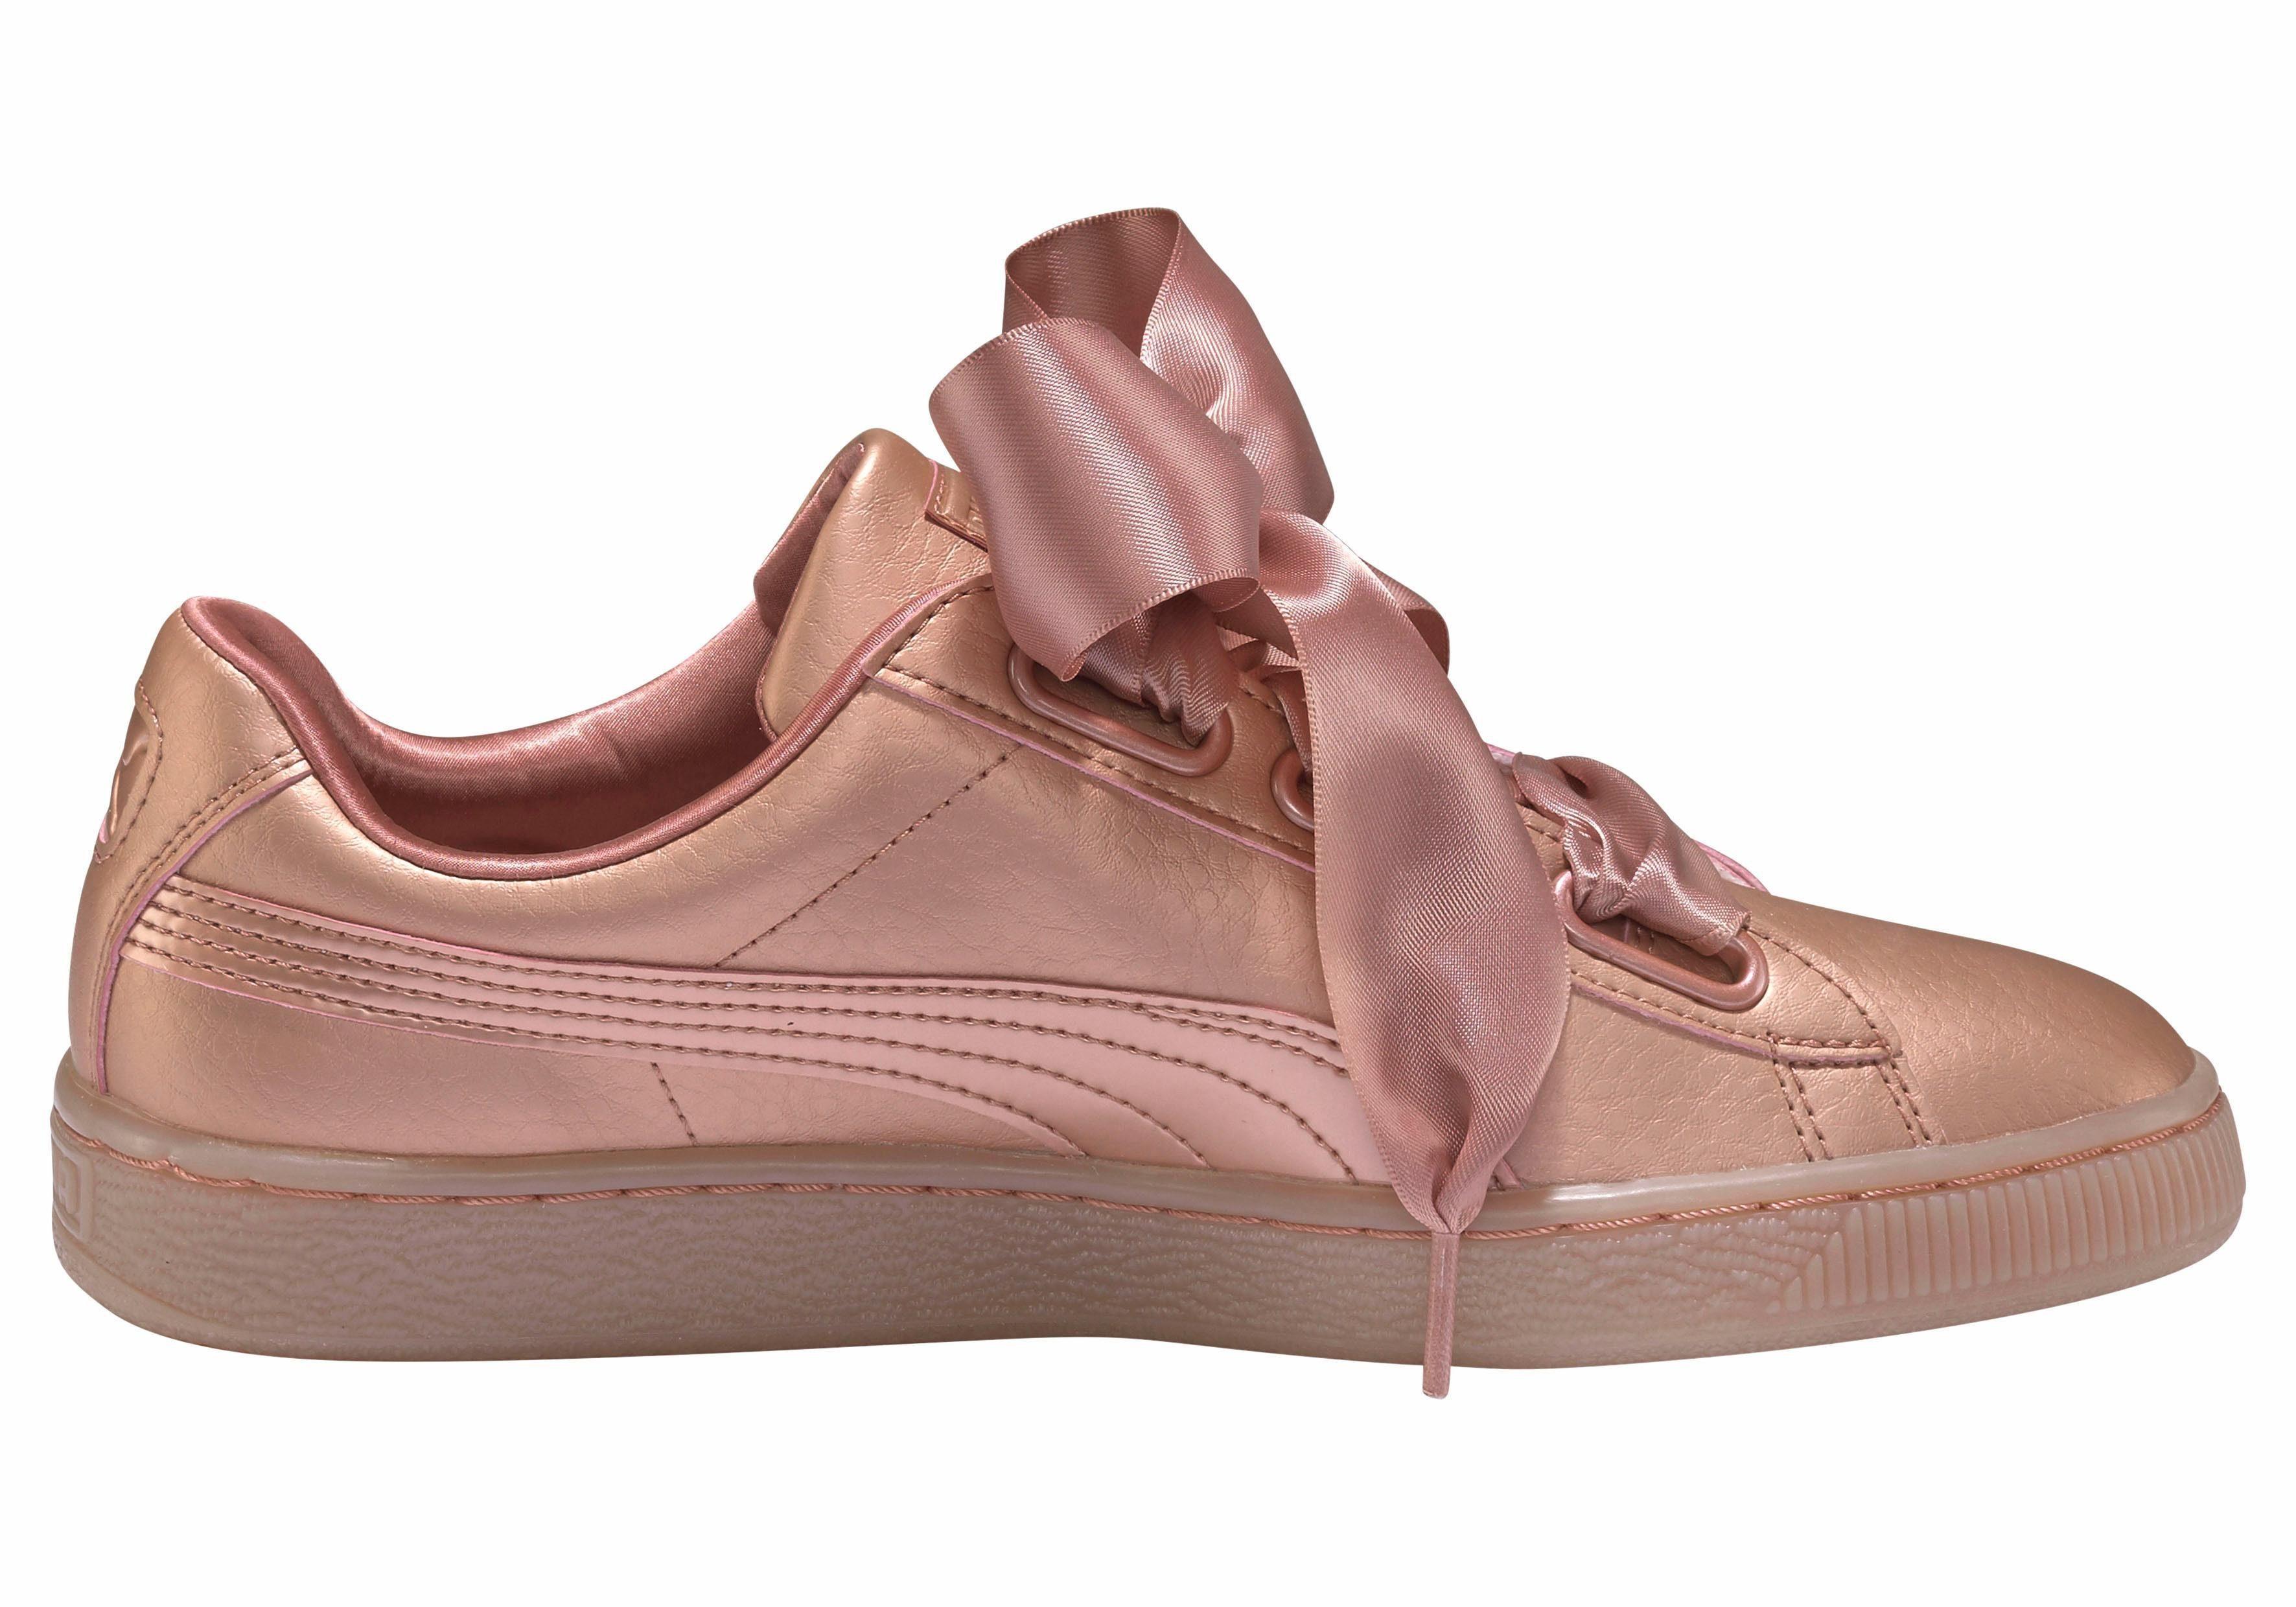 Pumas Panier Sneaker Femmes Cuivre Coeur - Roze - 38 Eu KZI17MM